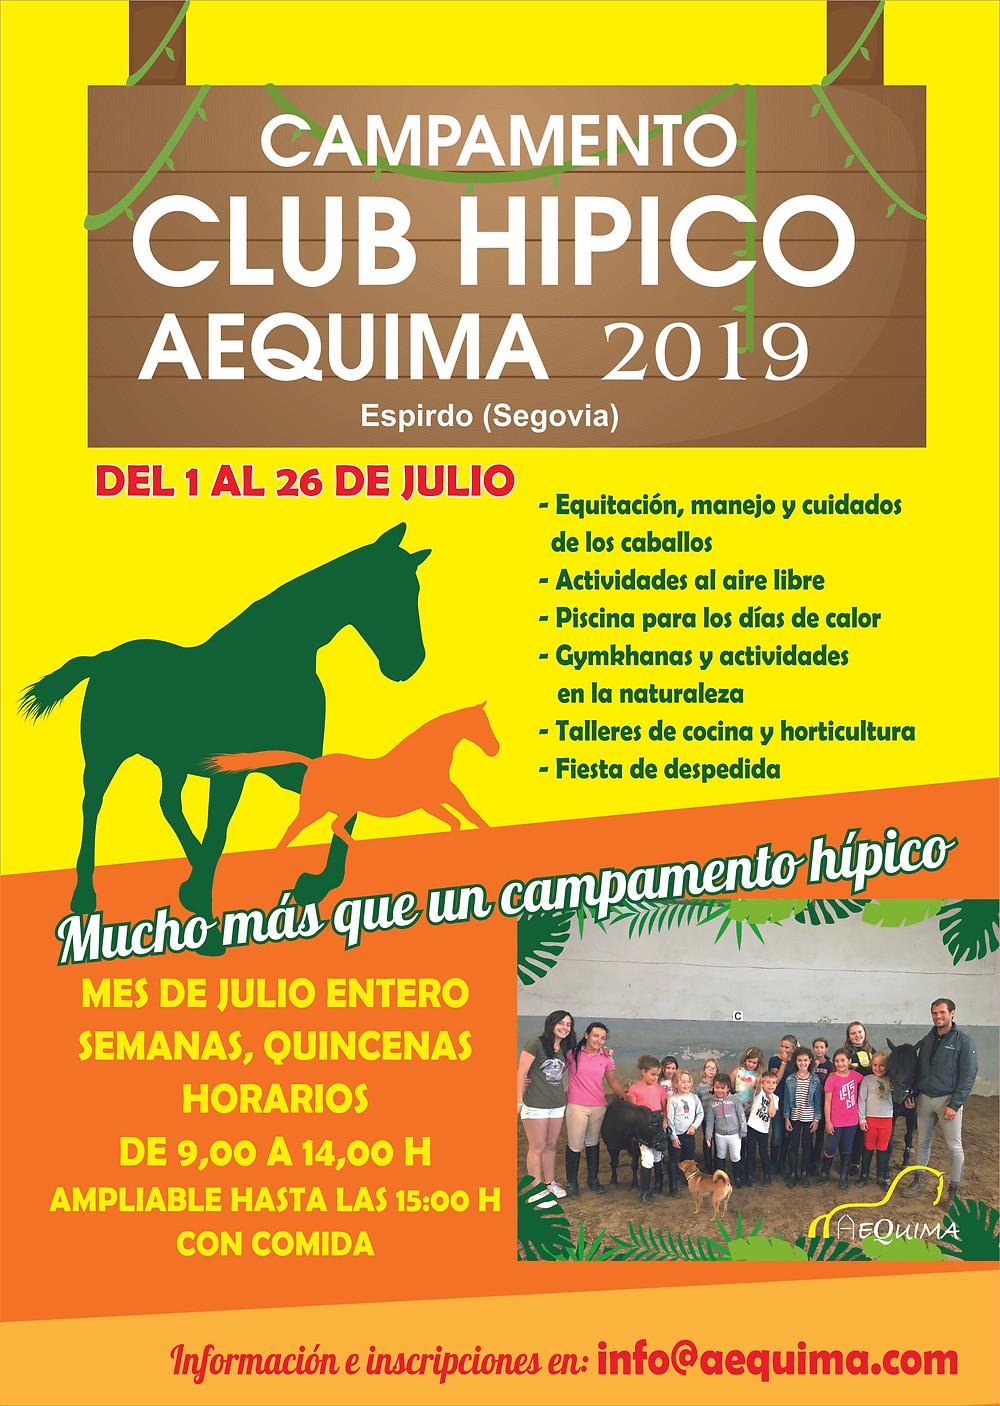 Cartel Campamento Club Hípico AEQUIMA 2019